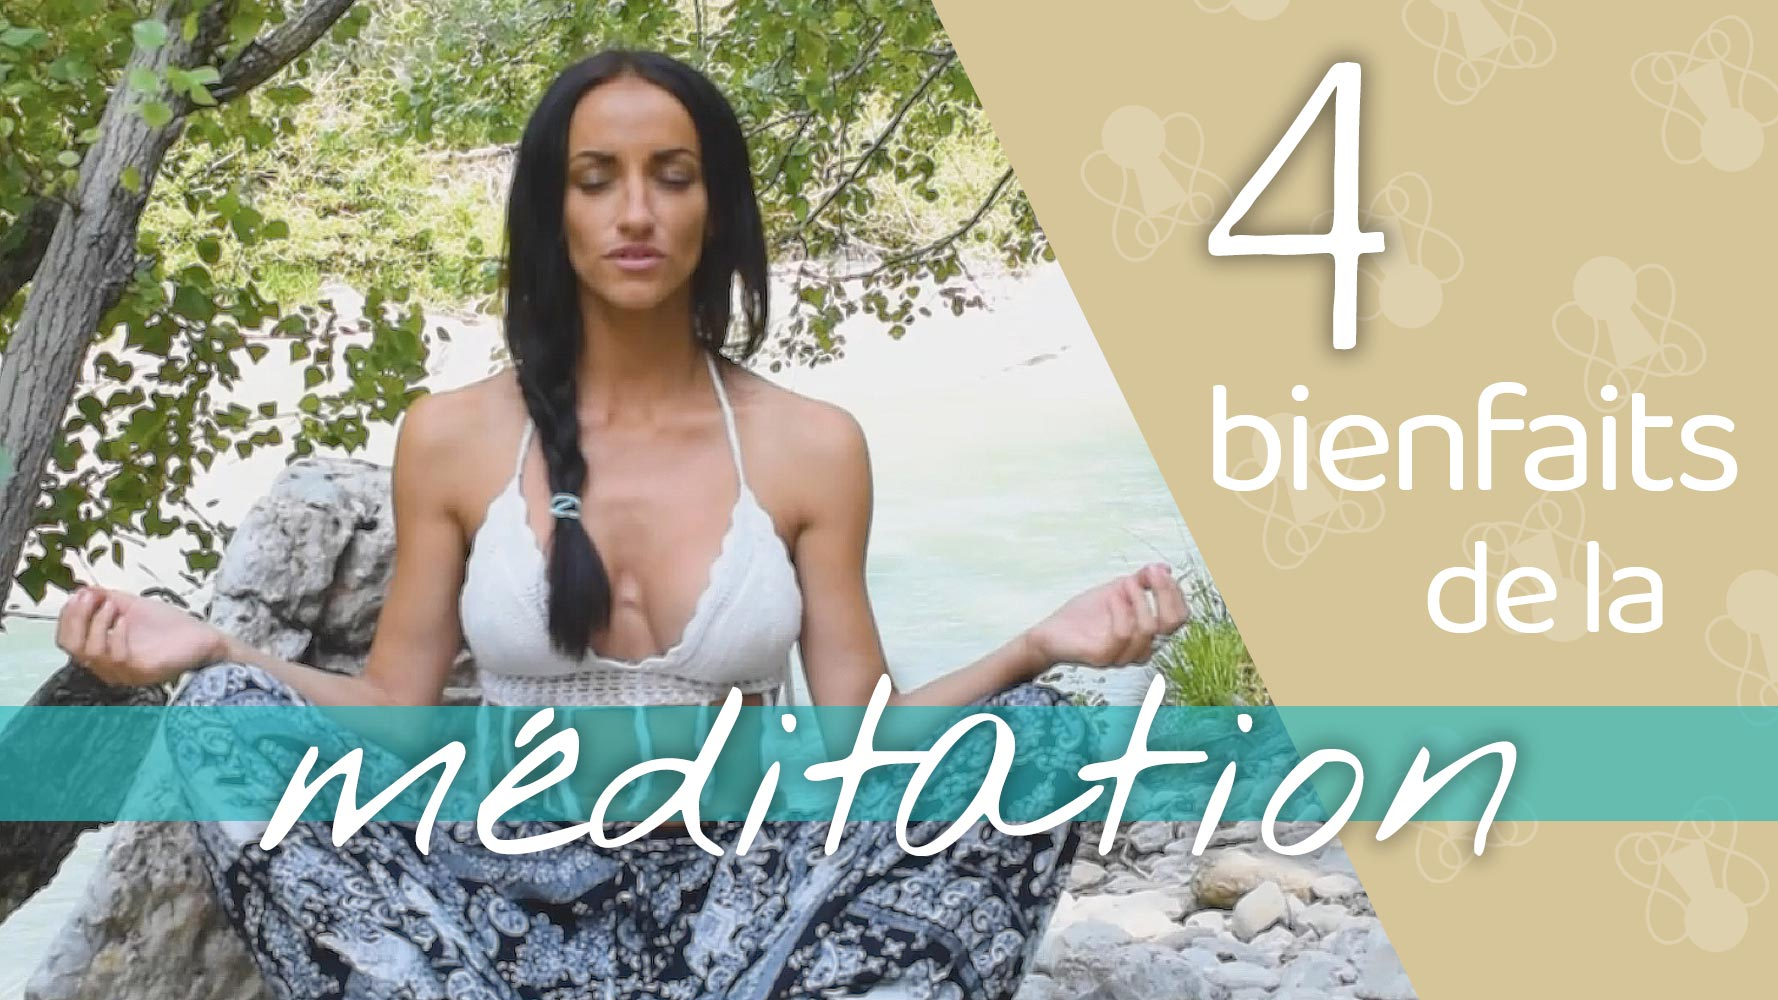 pourquoi mediter bienfaits meditation